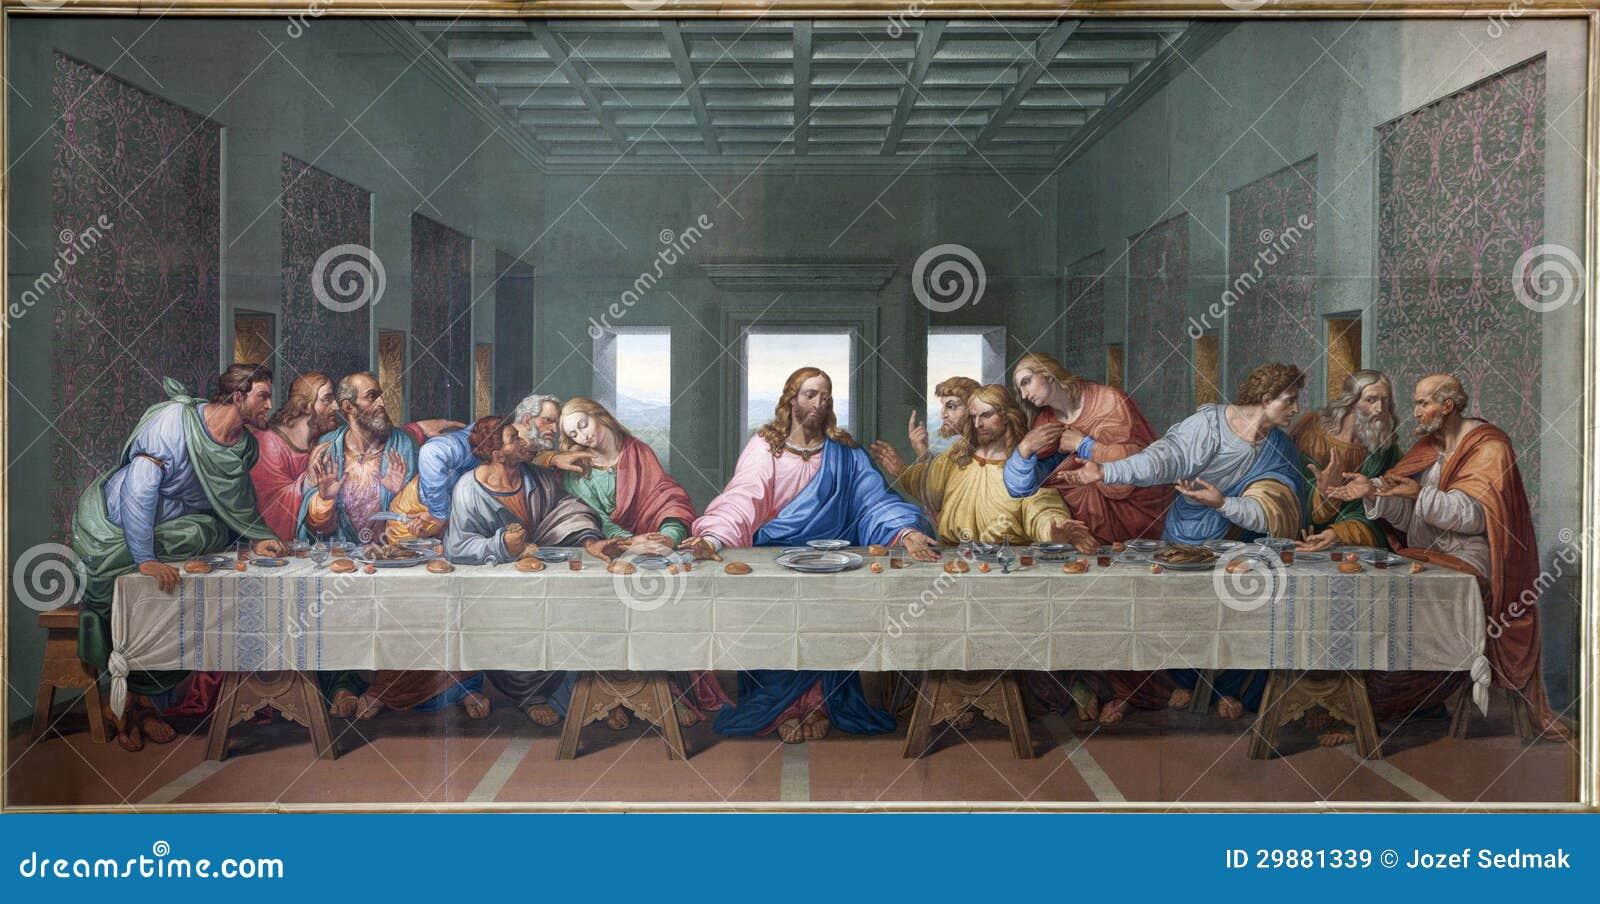 Wien - mosaik av den sist kvällsmålet av Jesus